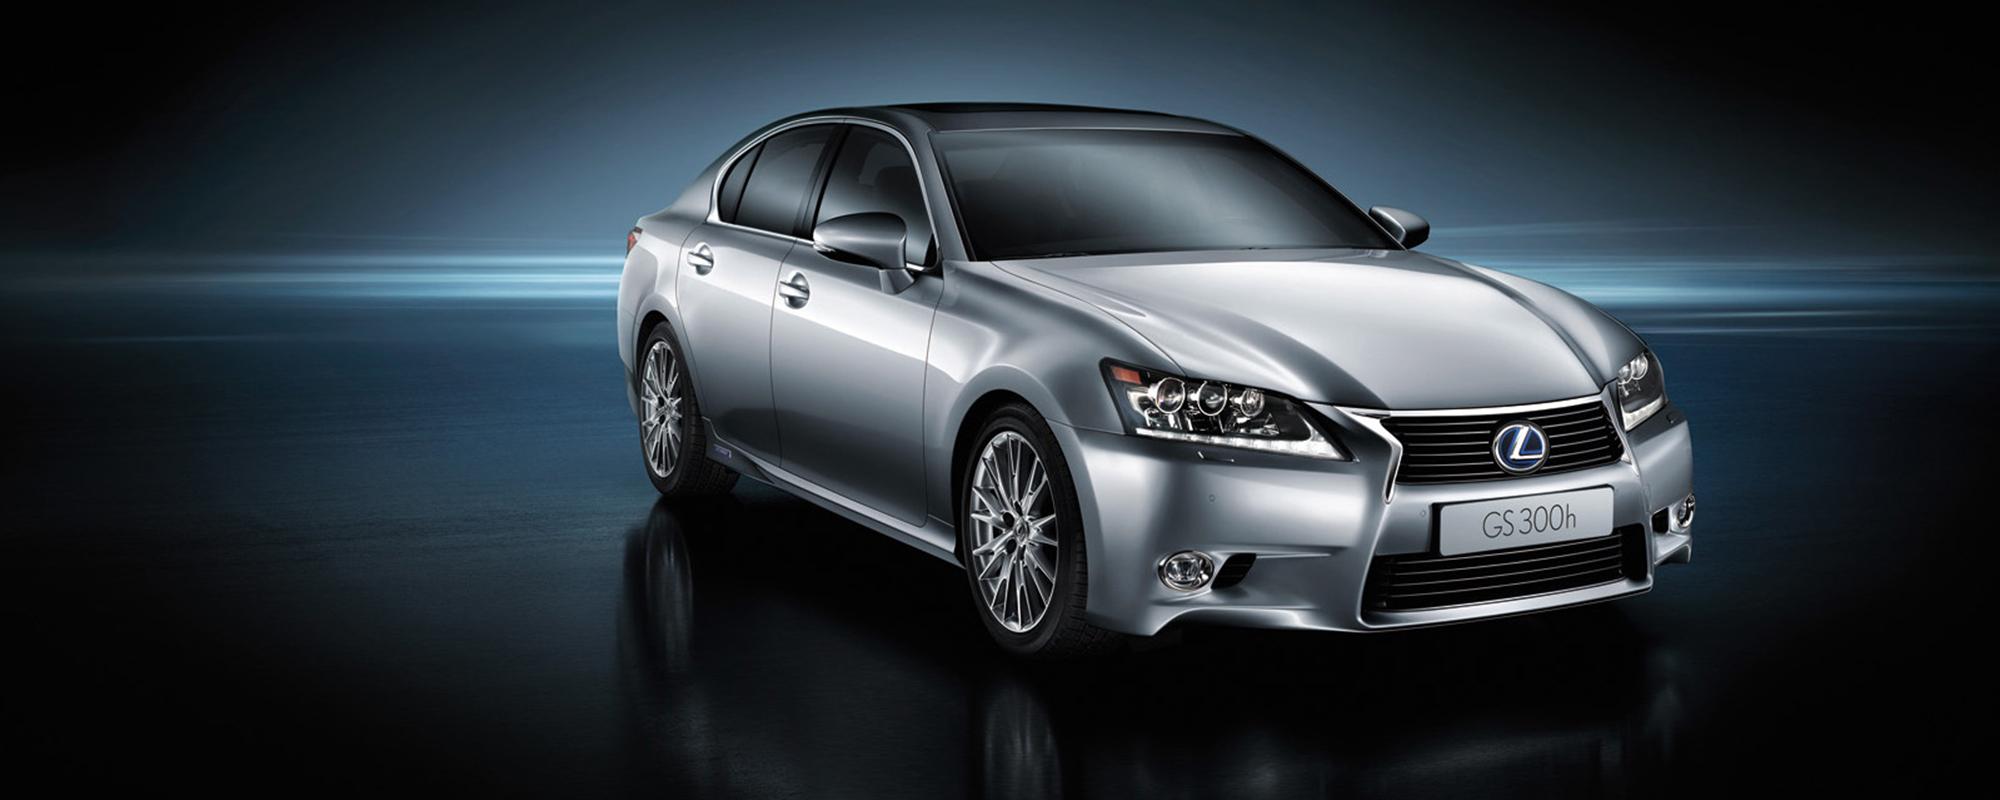 Lexus onthult GS 300h HYBRID: 20% bijtelling